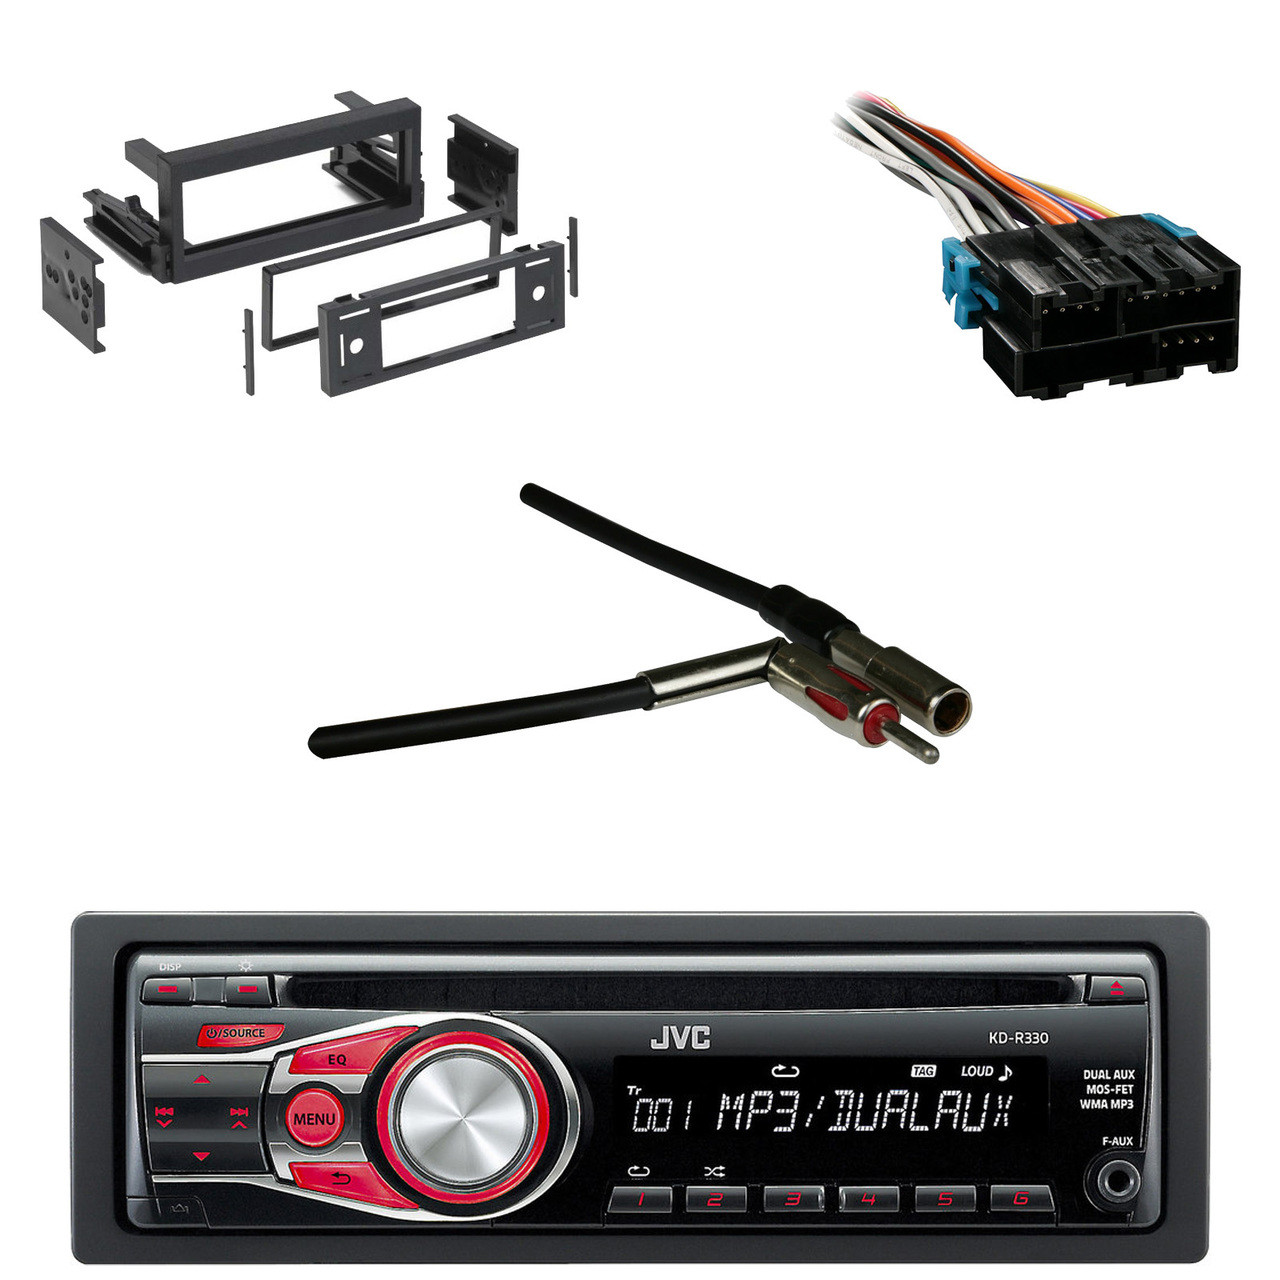 jvc kdr330 cd aux car radio antenn adapter gm wire harness gm rh roadentertainment com wiring [ 1280 x 1280 Pixel ]